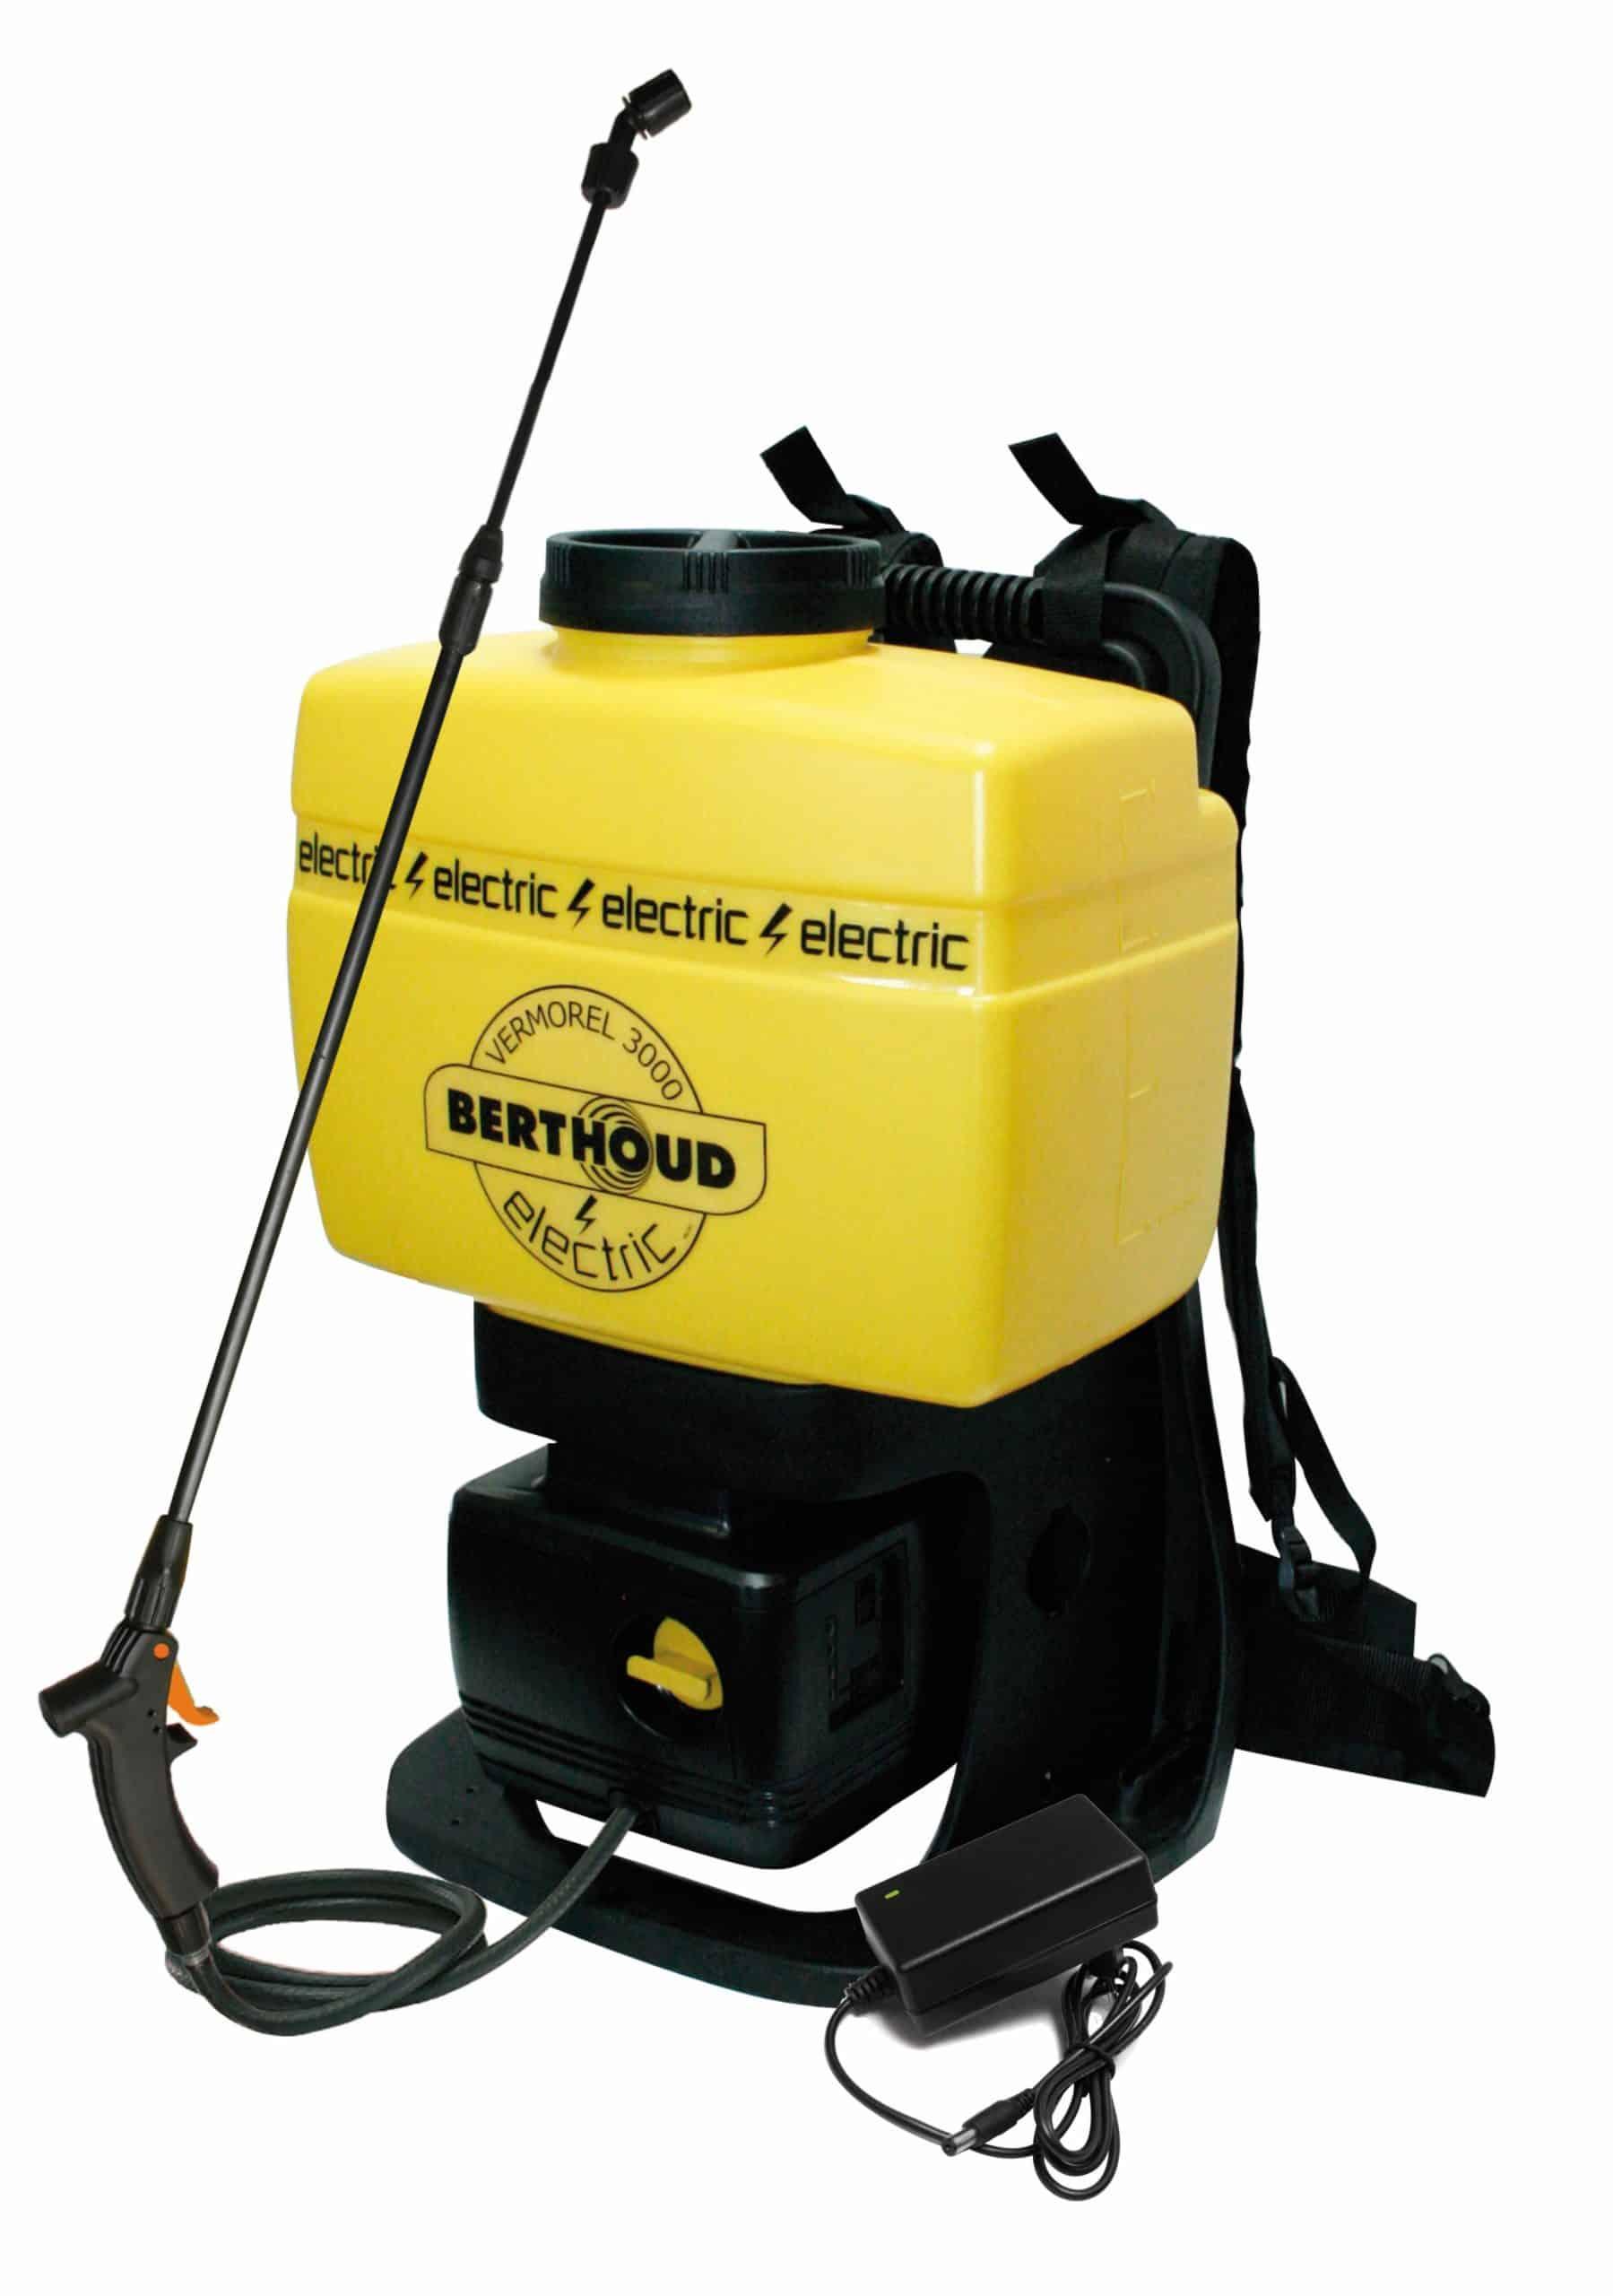 Berthoud Vermorel 3000 - Electric Knapsack Sprayer